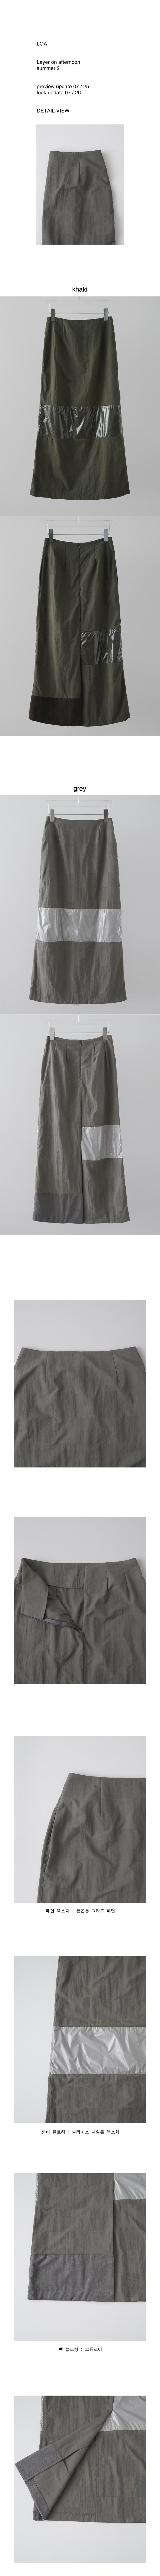 texture block maxi skirt